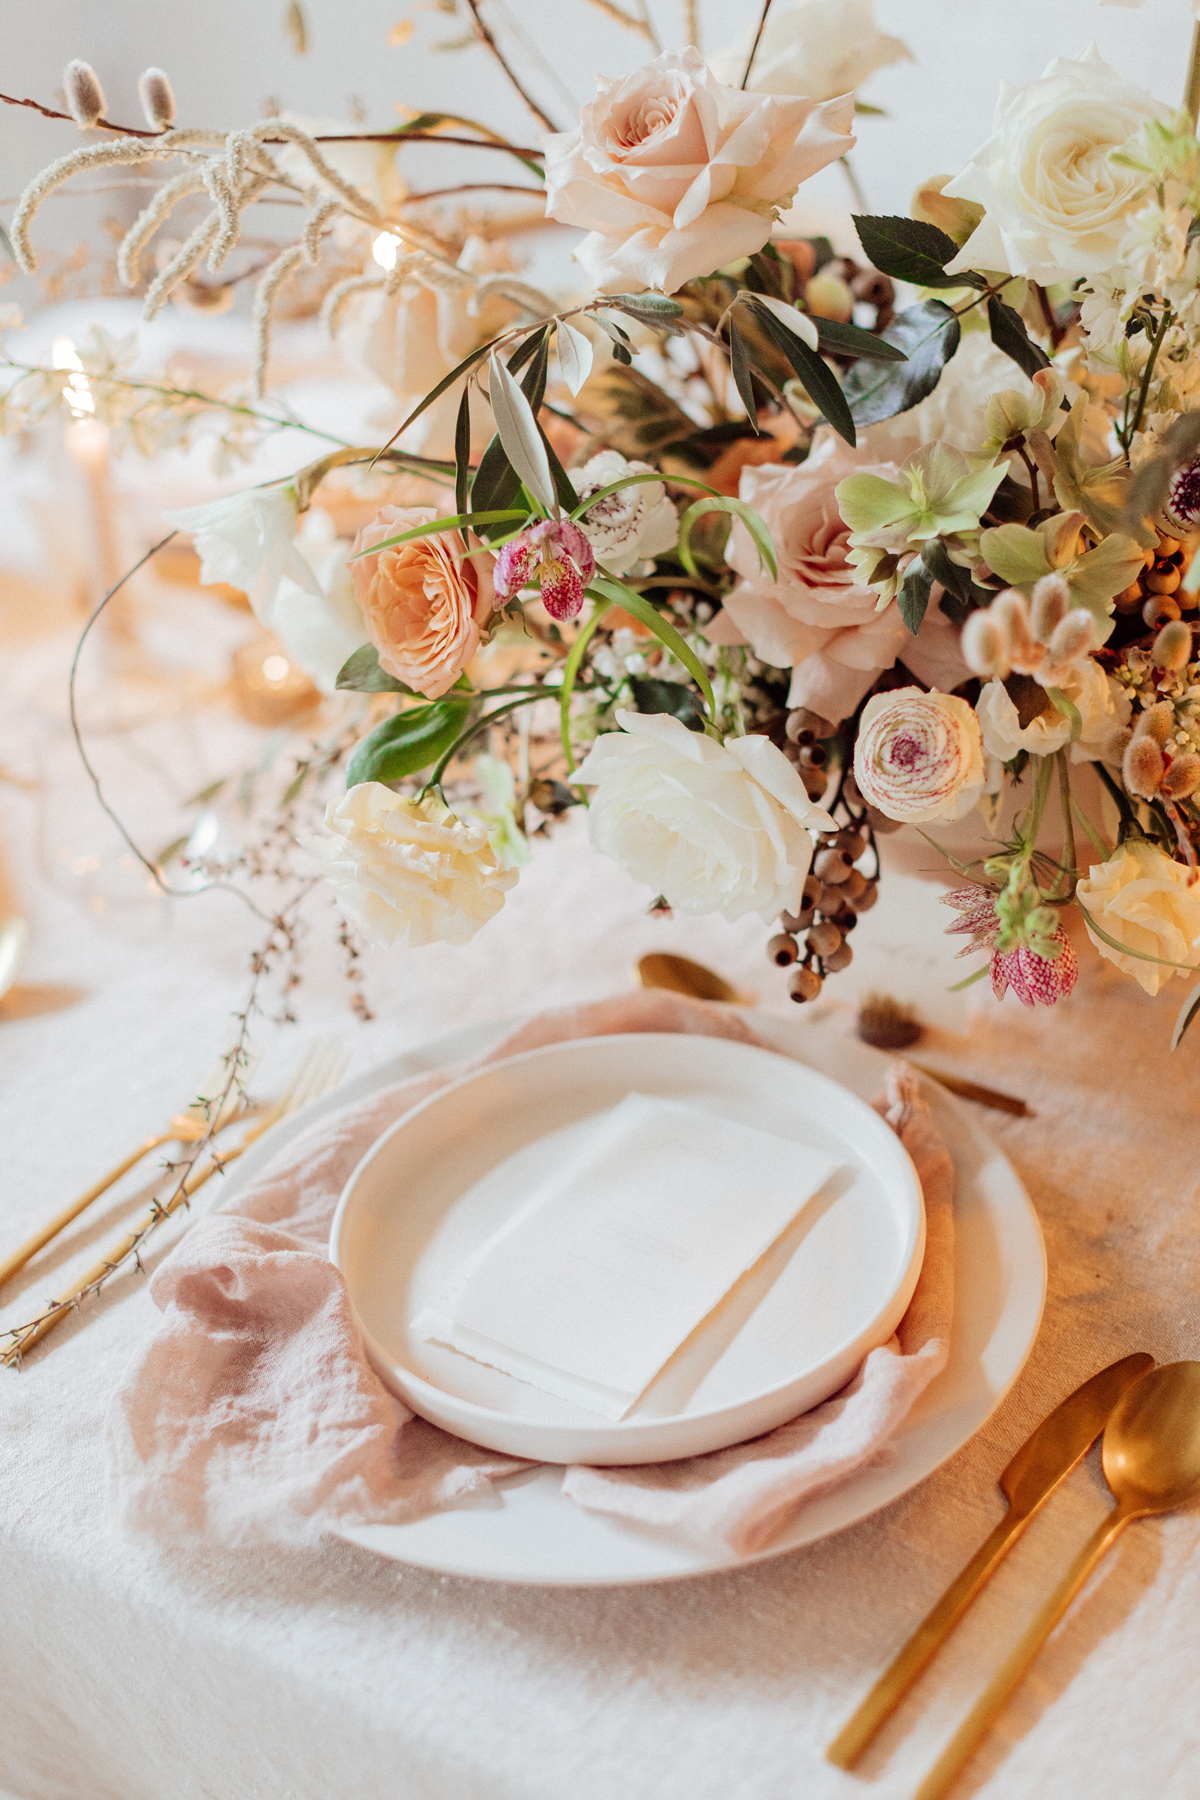 wedding reception napkin folds pink napkin draped beneath plate